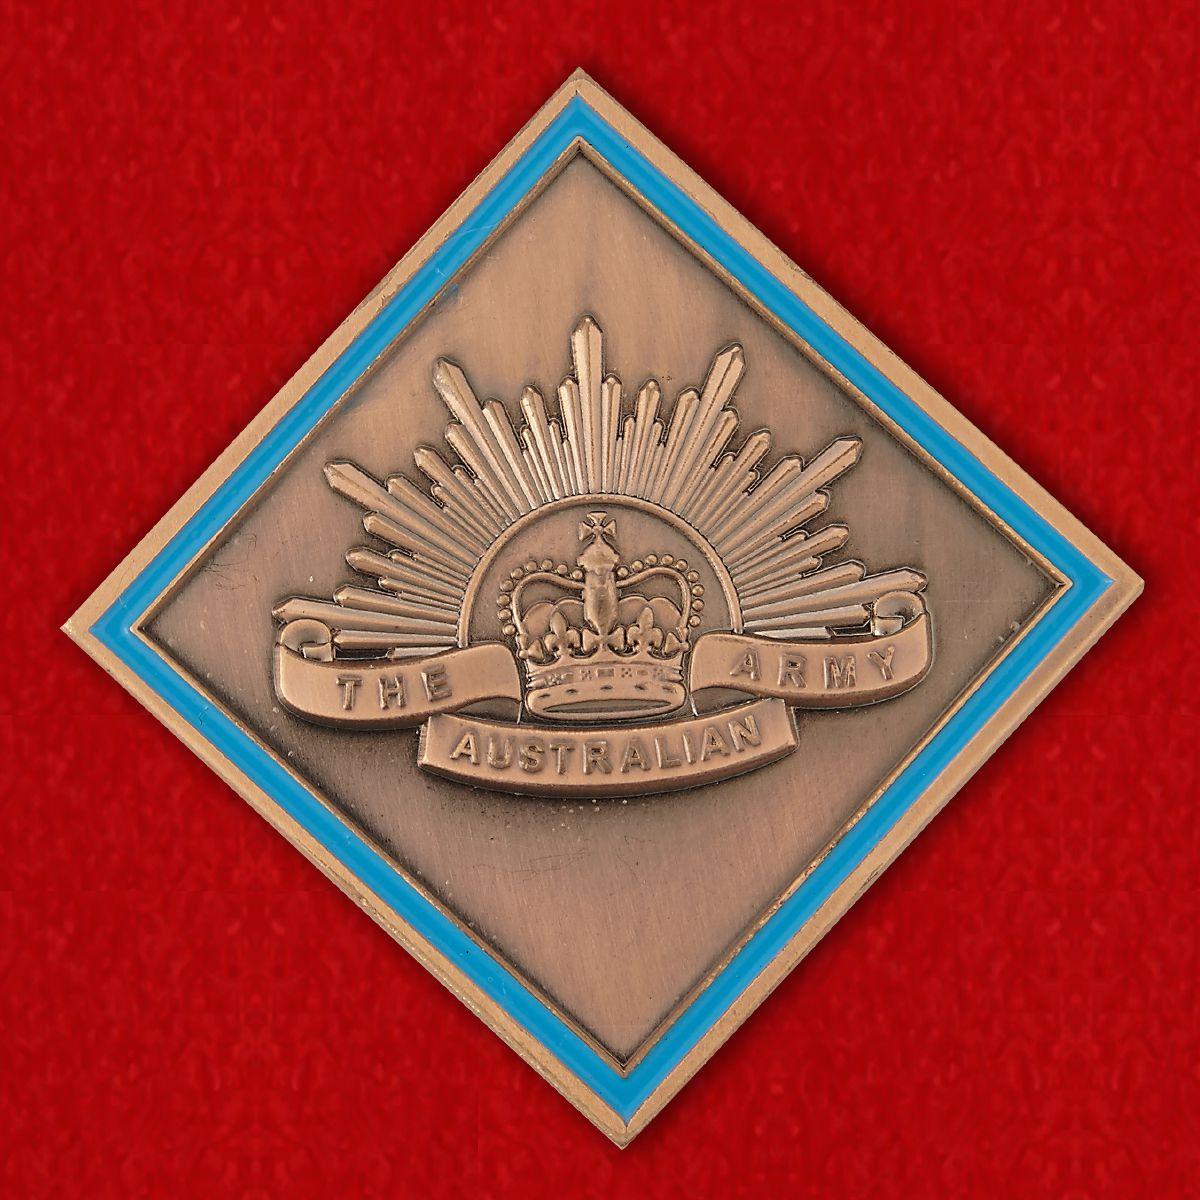 7th Brigade Australian Army Challenge Coin